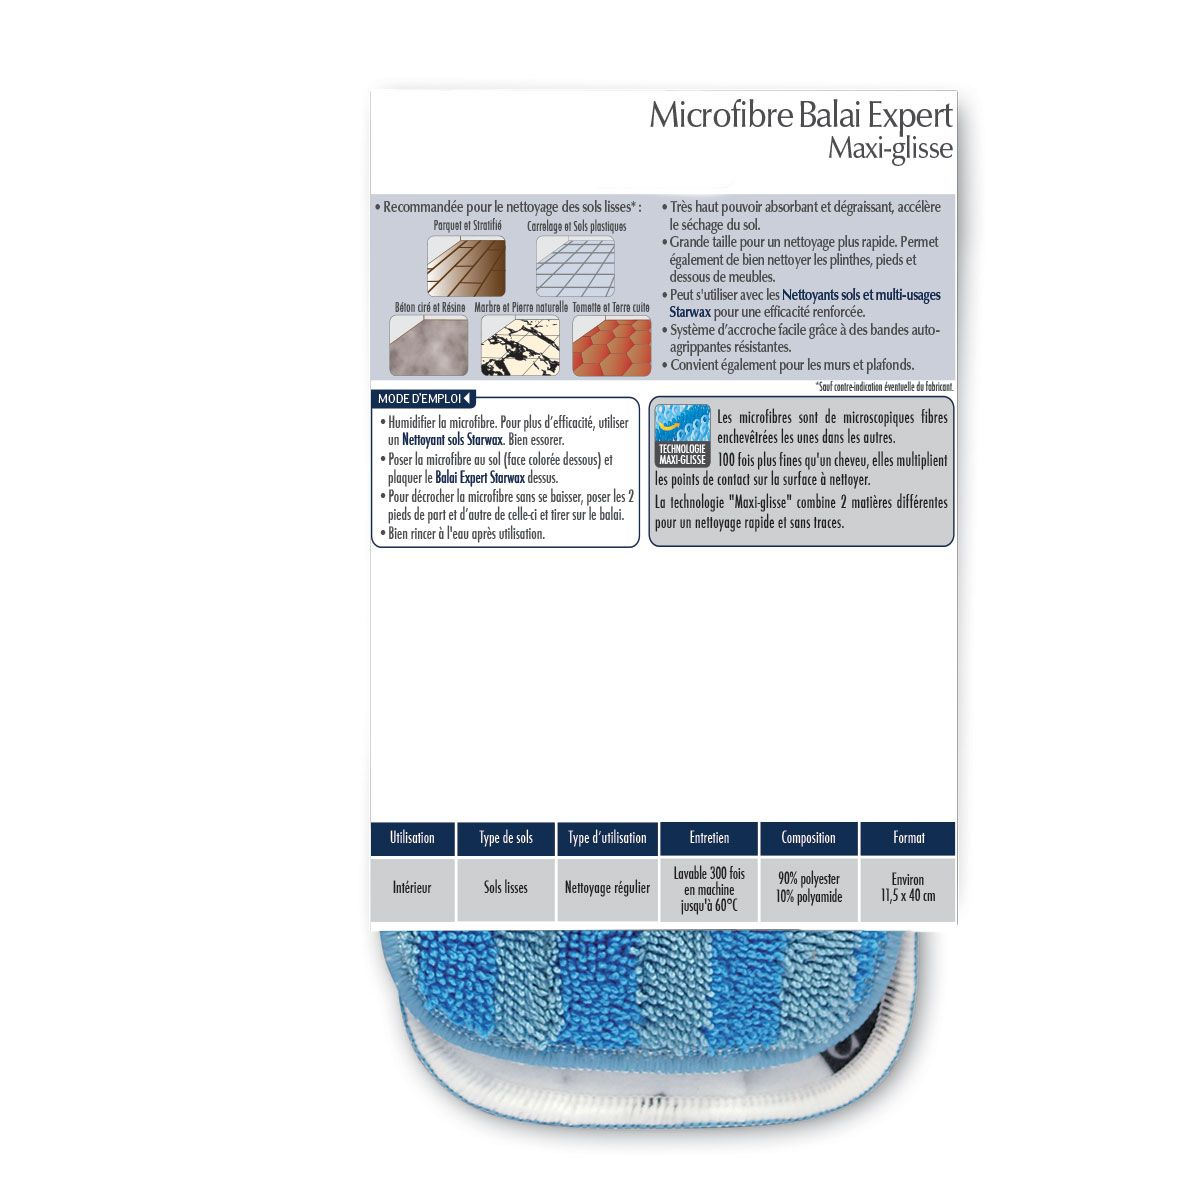 Microfibre maxi-glisse balai expert